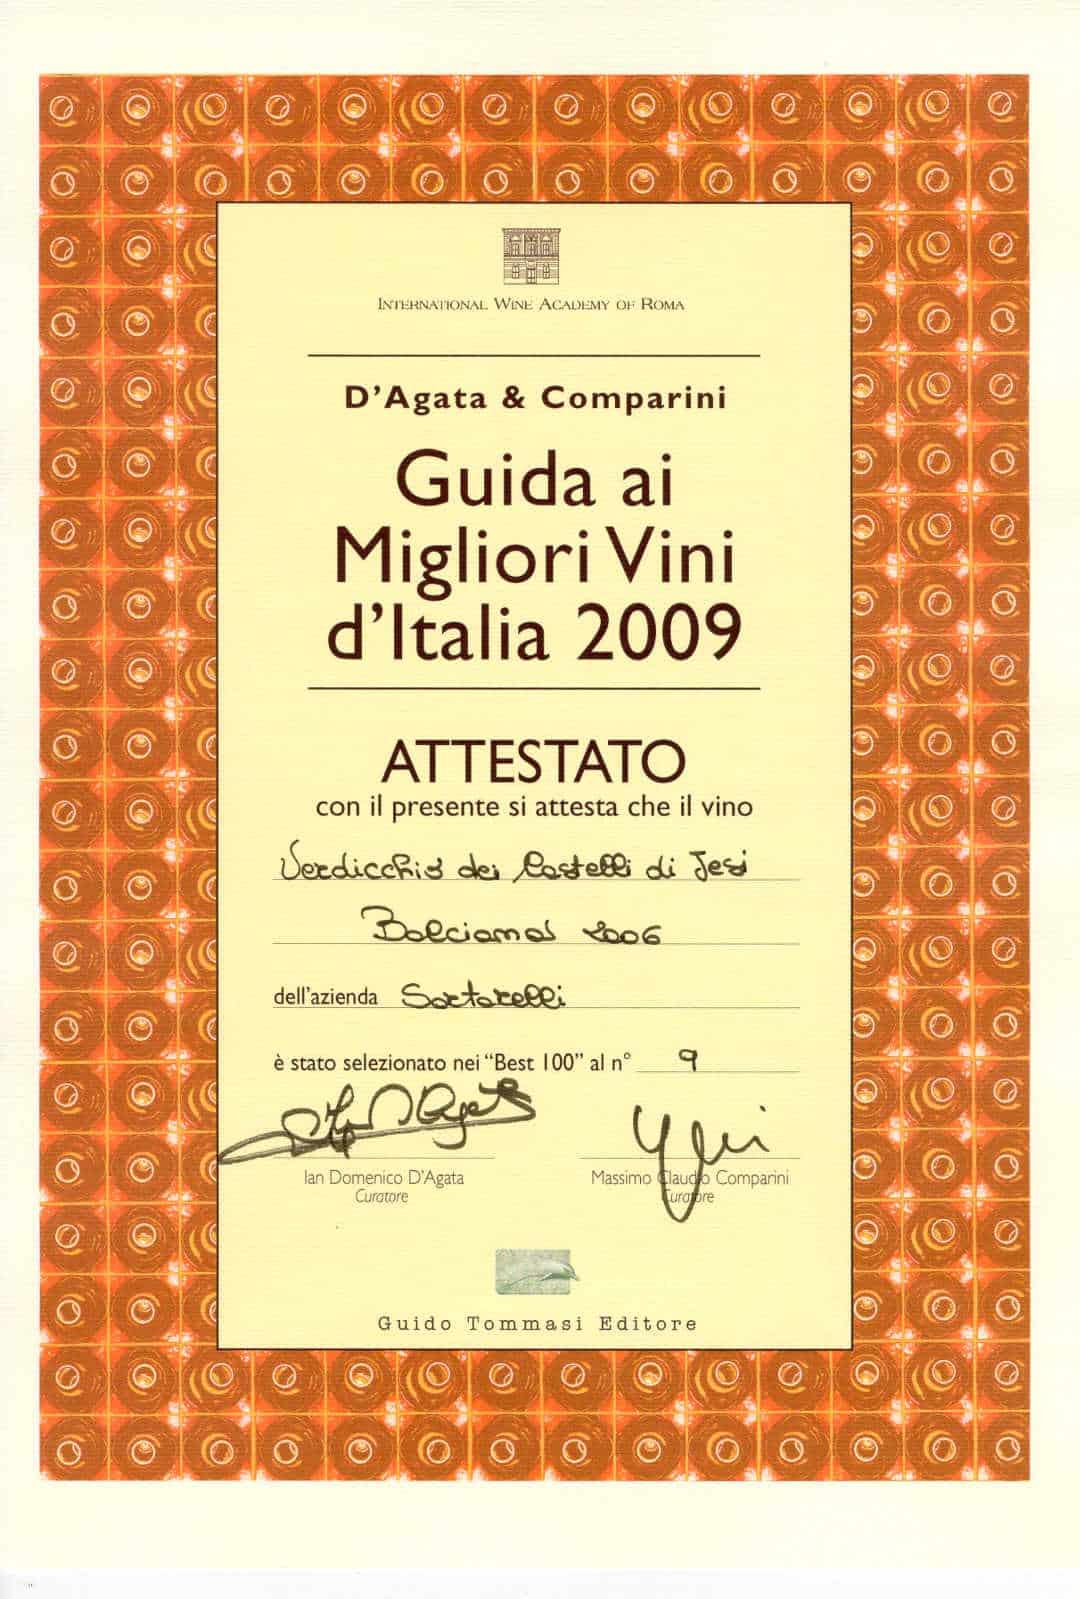 Balciana 2006 - Best 100 Vini d'Italia 2009